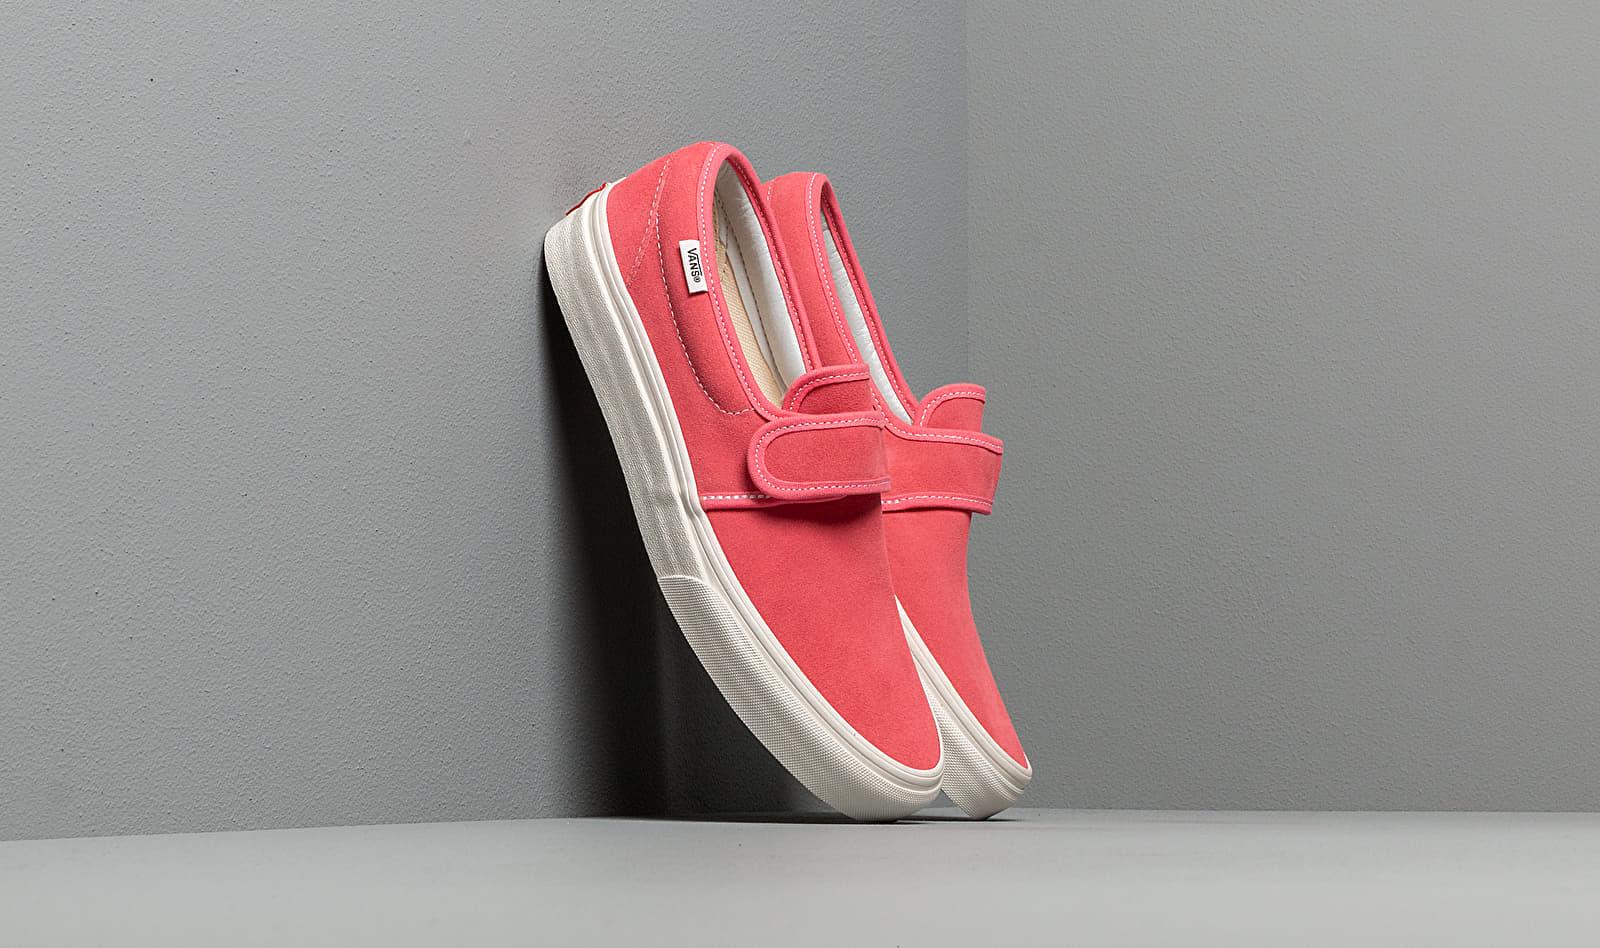 Vans Slip-On 47 V (Suede) Strawberry Pink/ B VN0A3WM4VSZ1